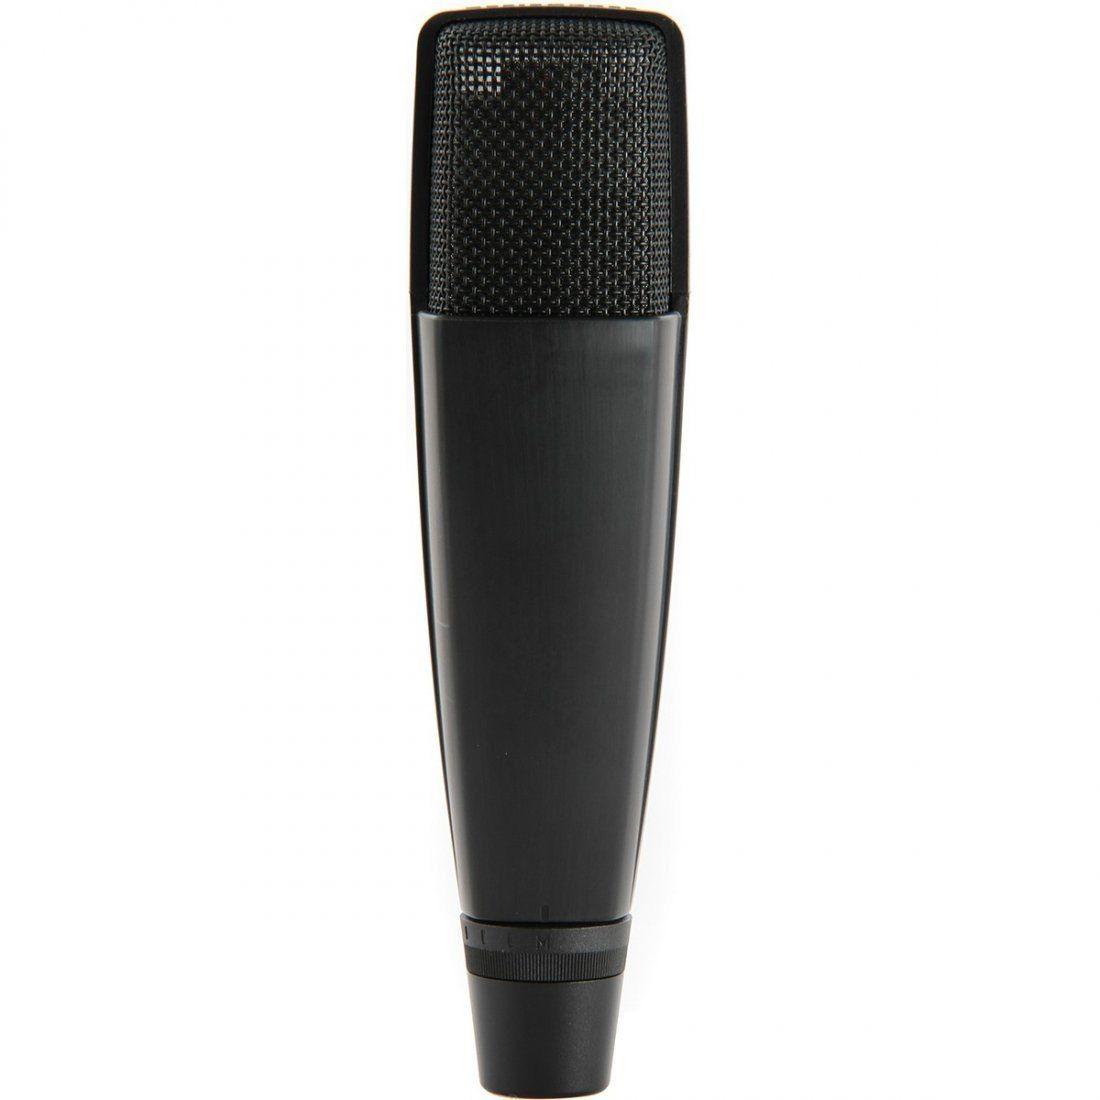 Sennheiser MD 421-II Microfone Dinâmico Cardioide Sennheiser MD-421 II para Instrumentos